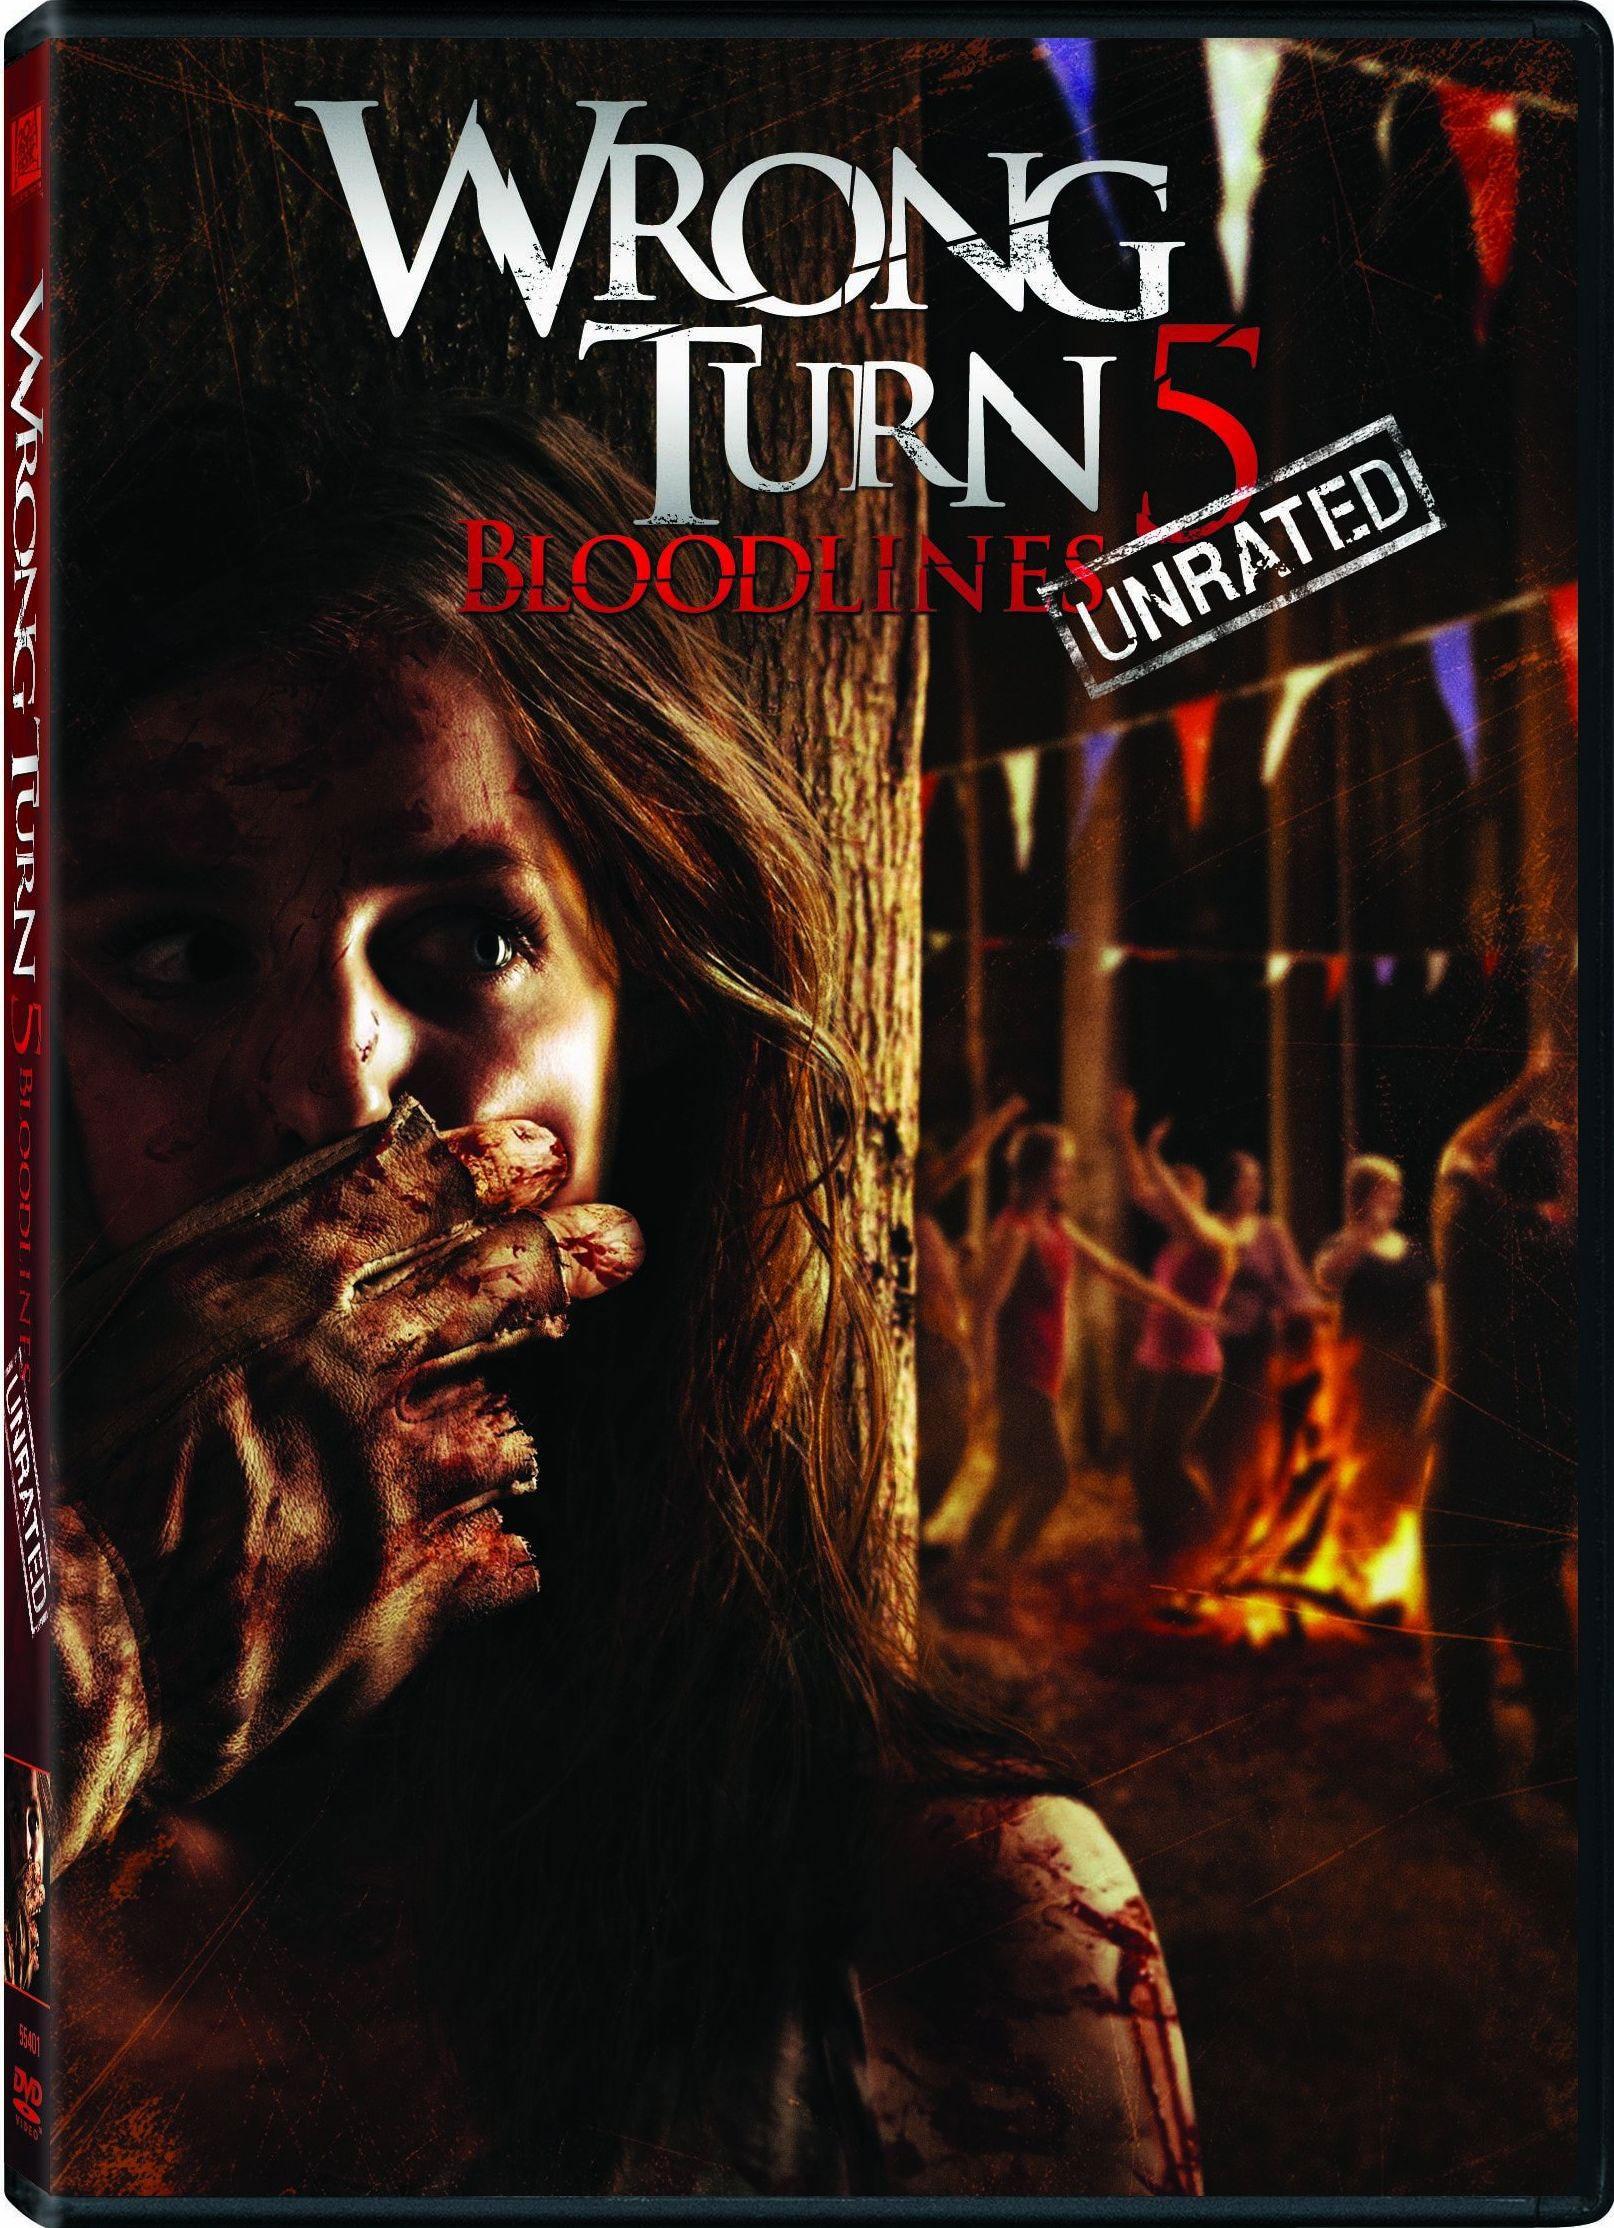 Wrong Turn 5 Bloodlines (DVD)